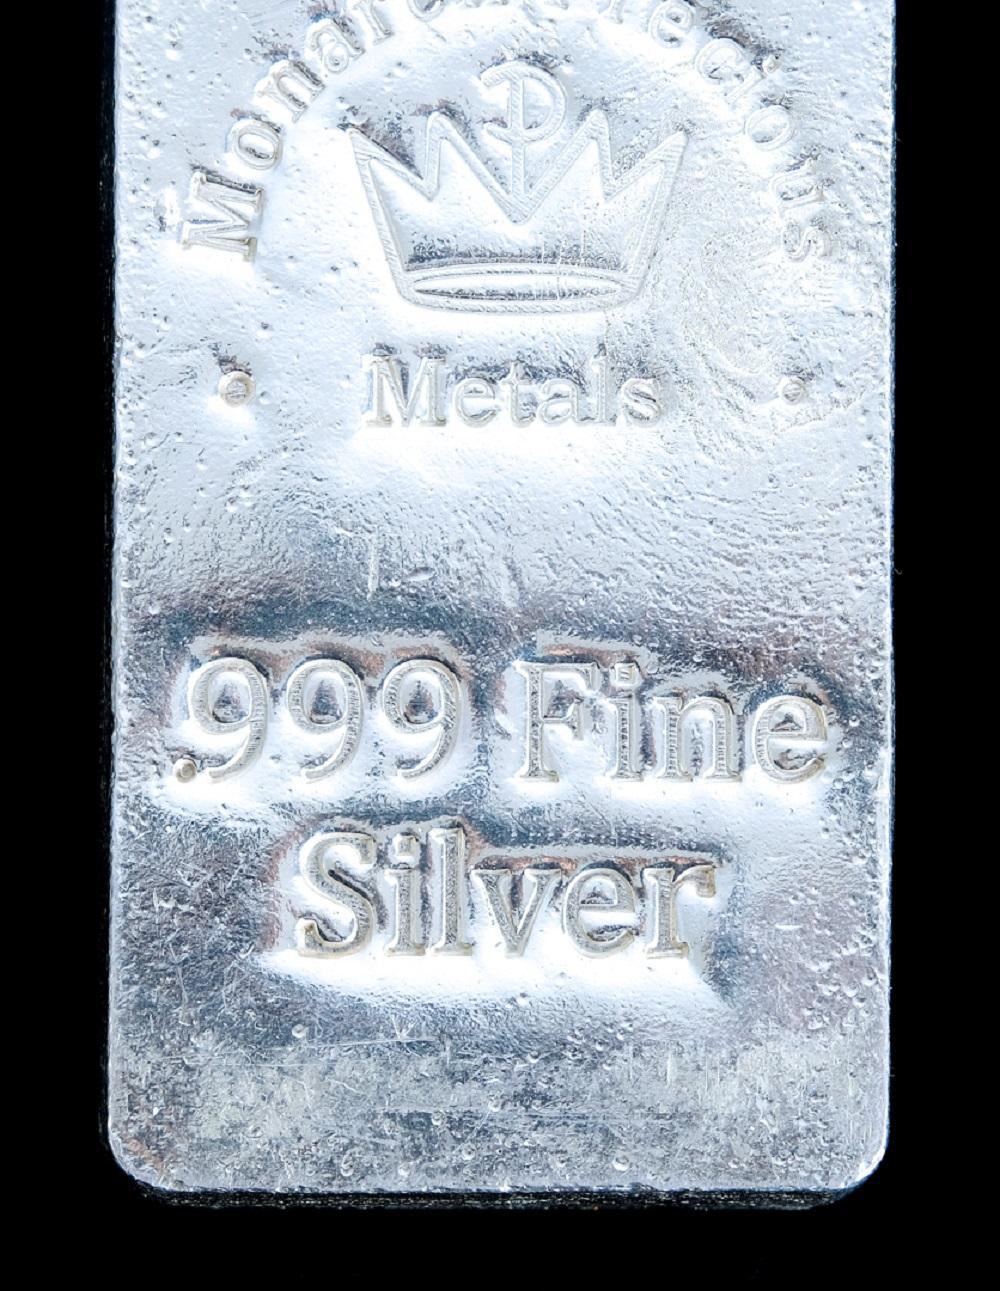 100 oz Monarch Hand Poured Stacker Silver Bar